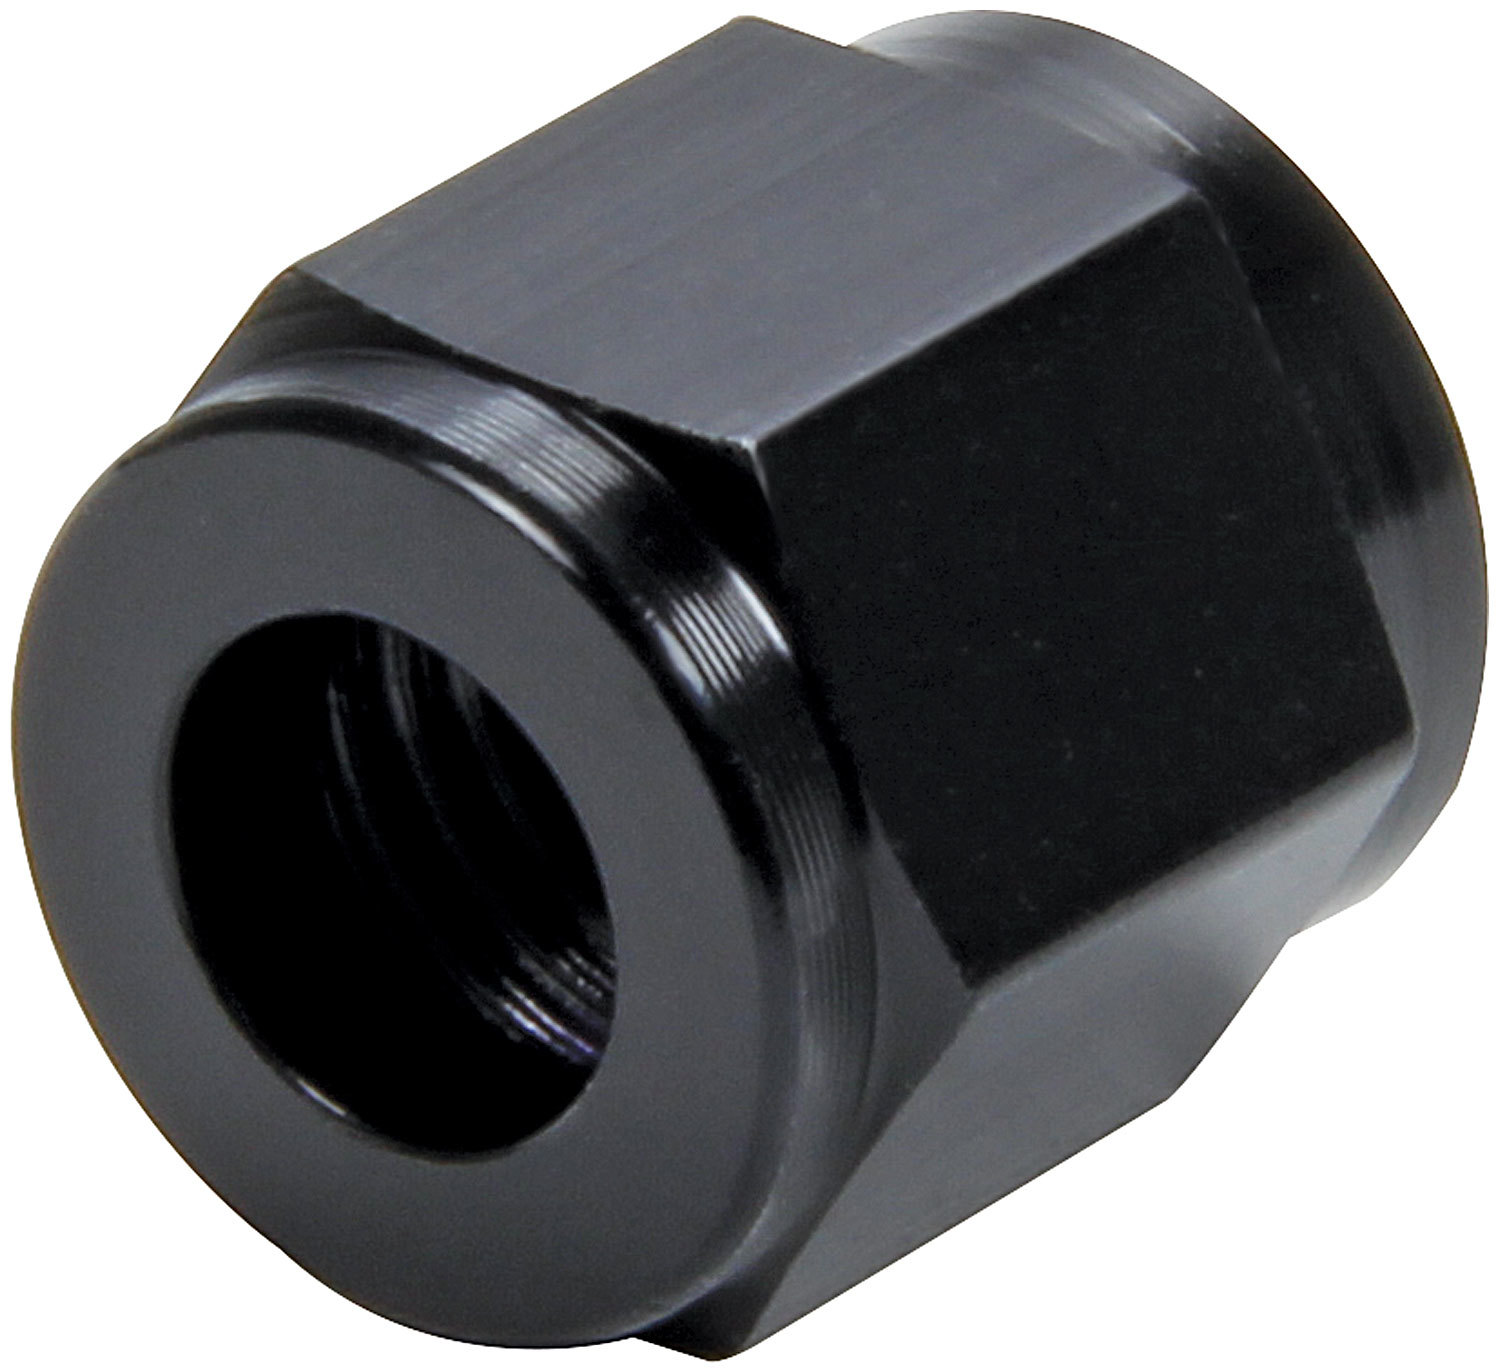 Allstar Performance 50321-20 Fitting, Tube Nut, 4 AN, 1/4 in Tube, Aluminum, Black Anodize, Set of 20